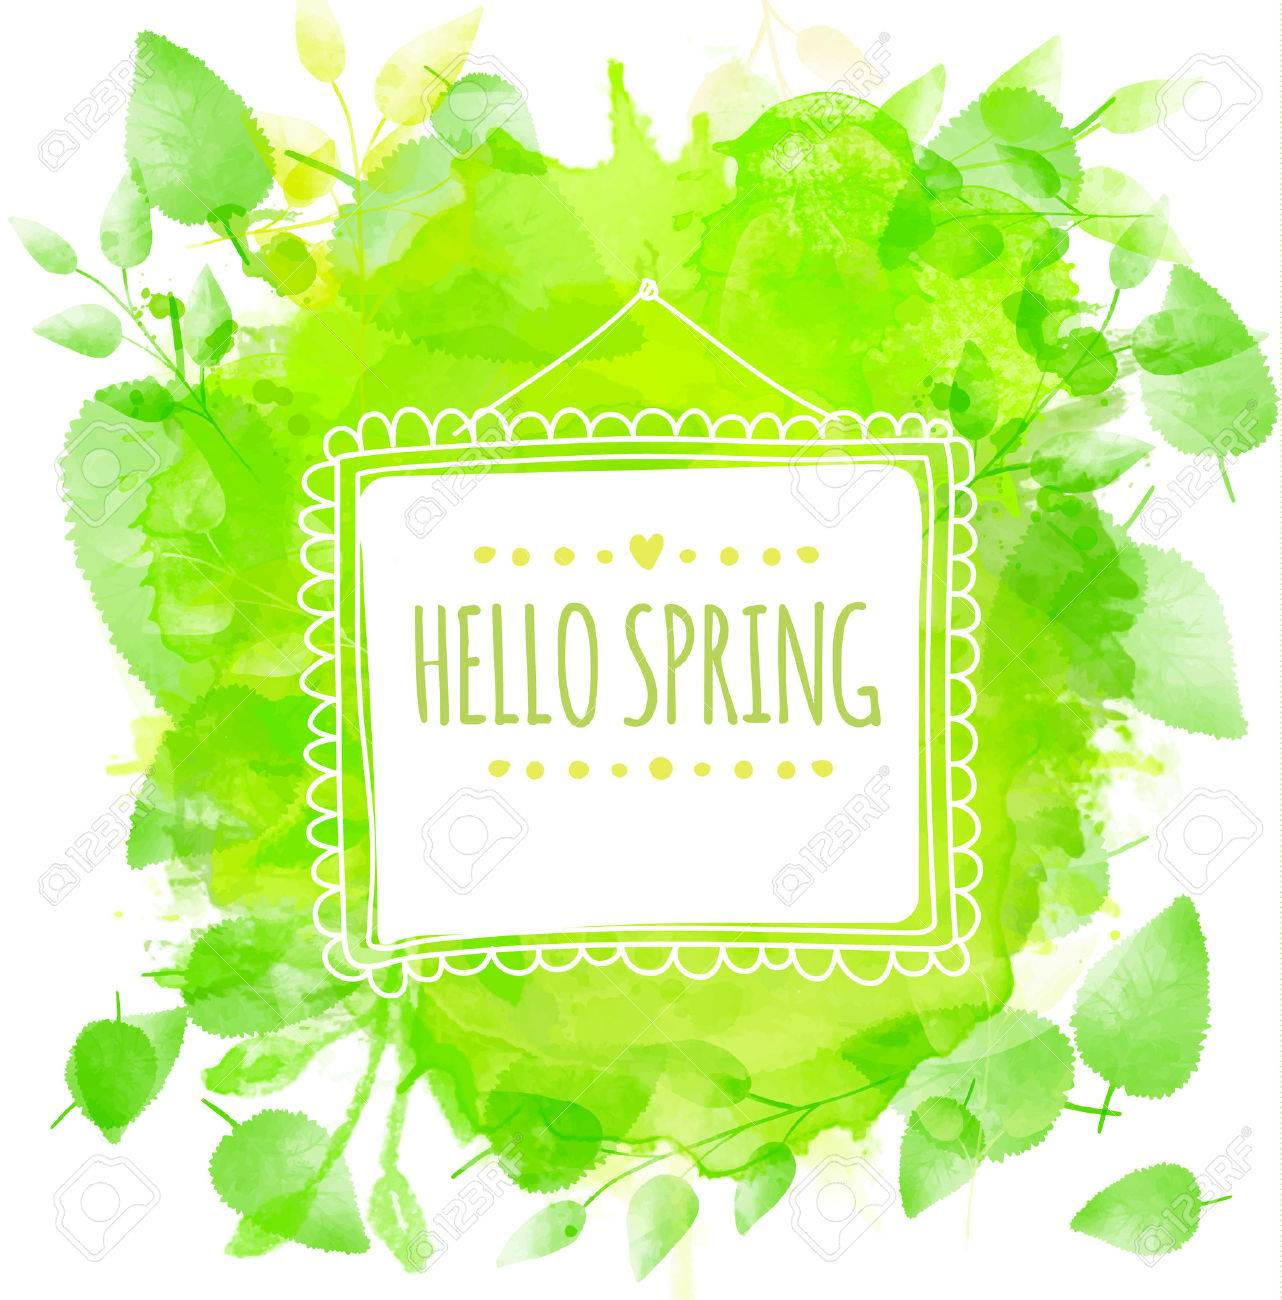 Quadratischen Rahmen Mit Text Hallo Frühling. Grüne Aquarell Splash ...